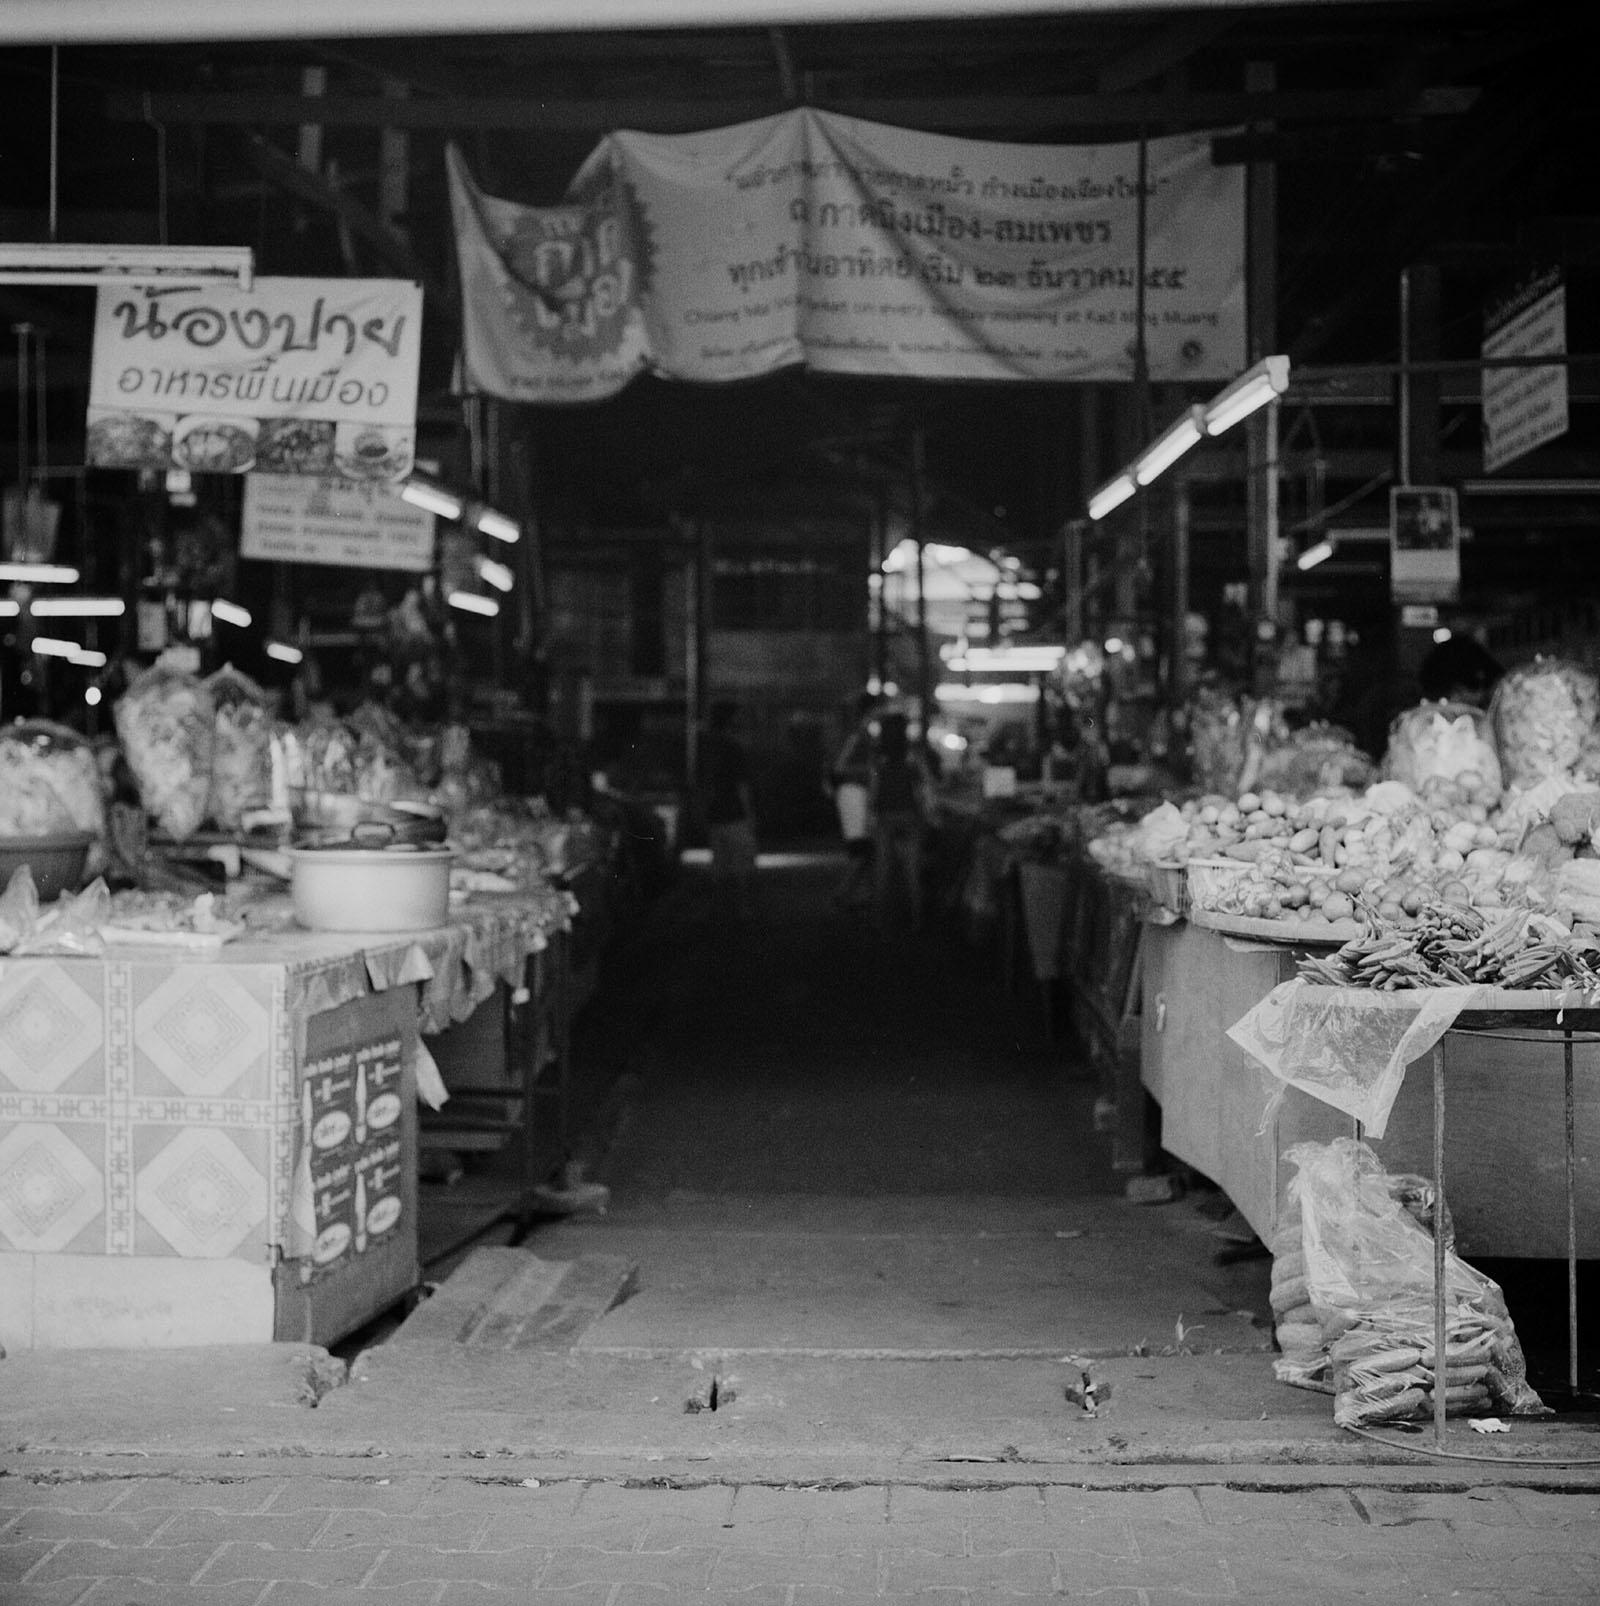 Street Markets in Chiang Mai | Thailand Travel Photos